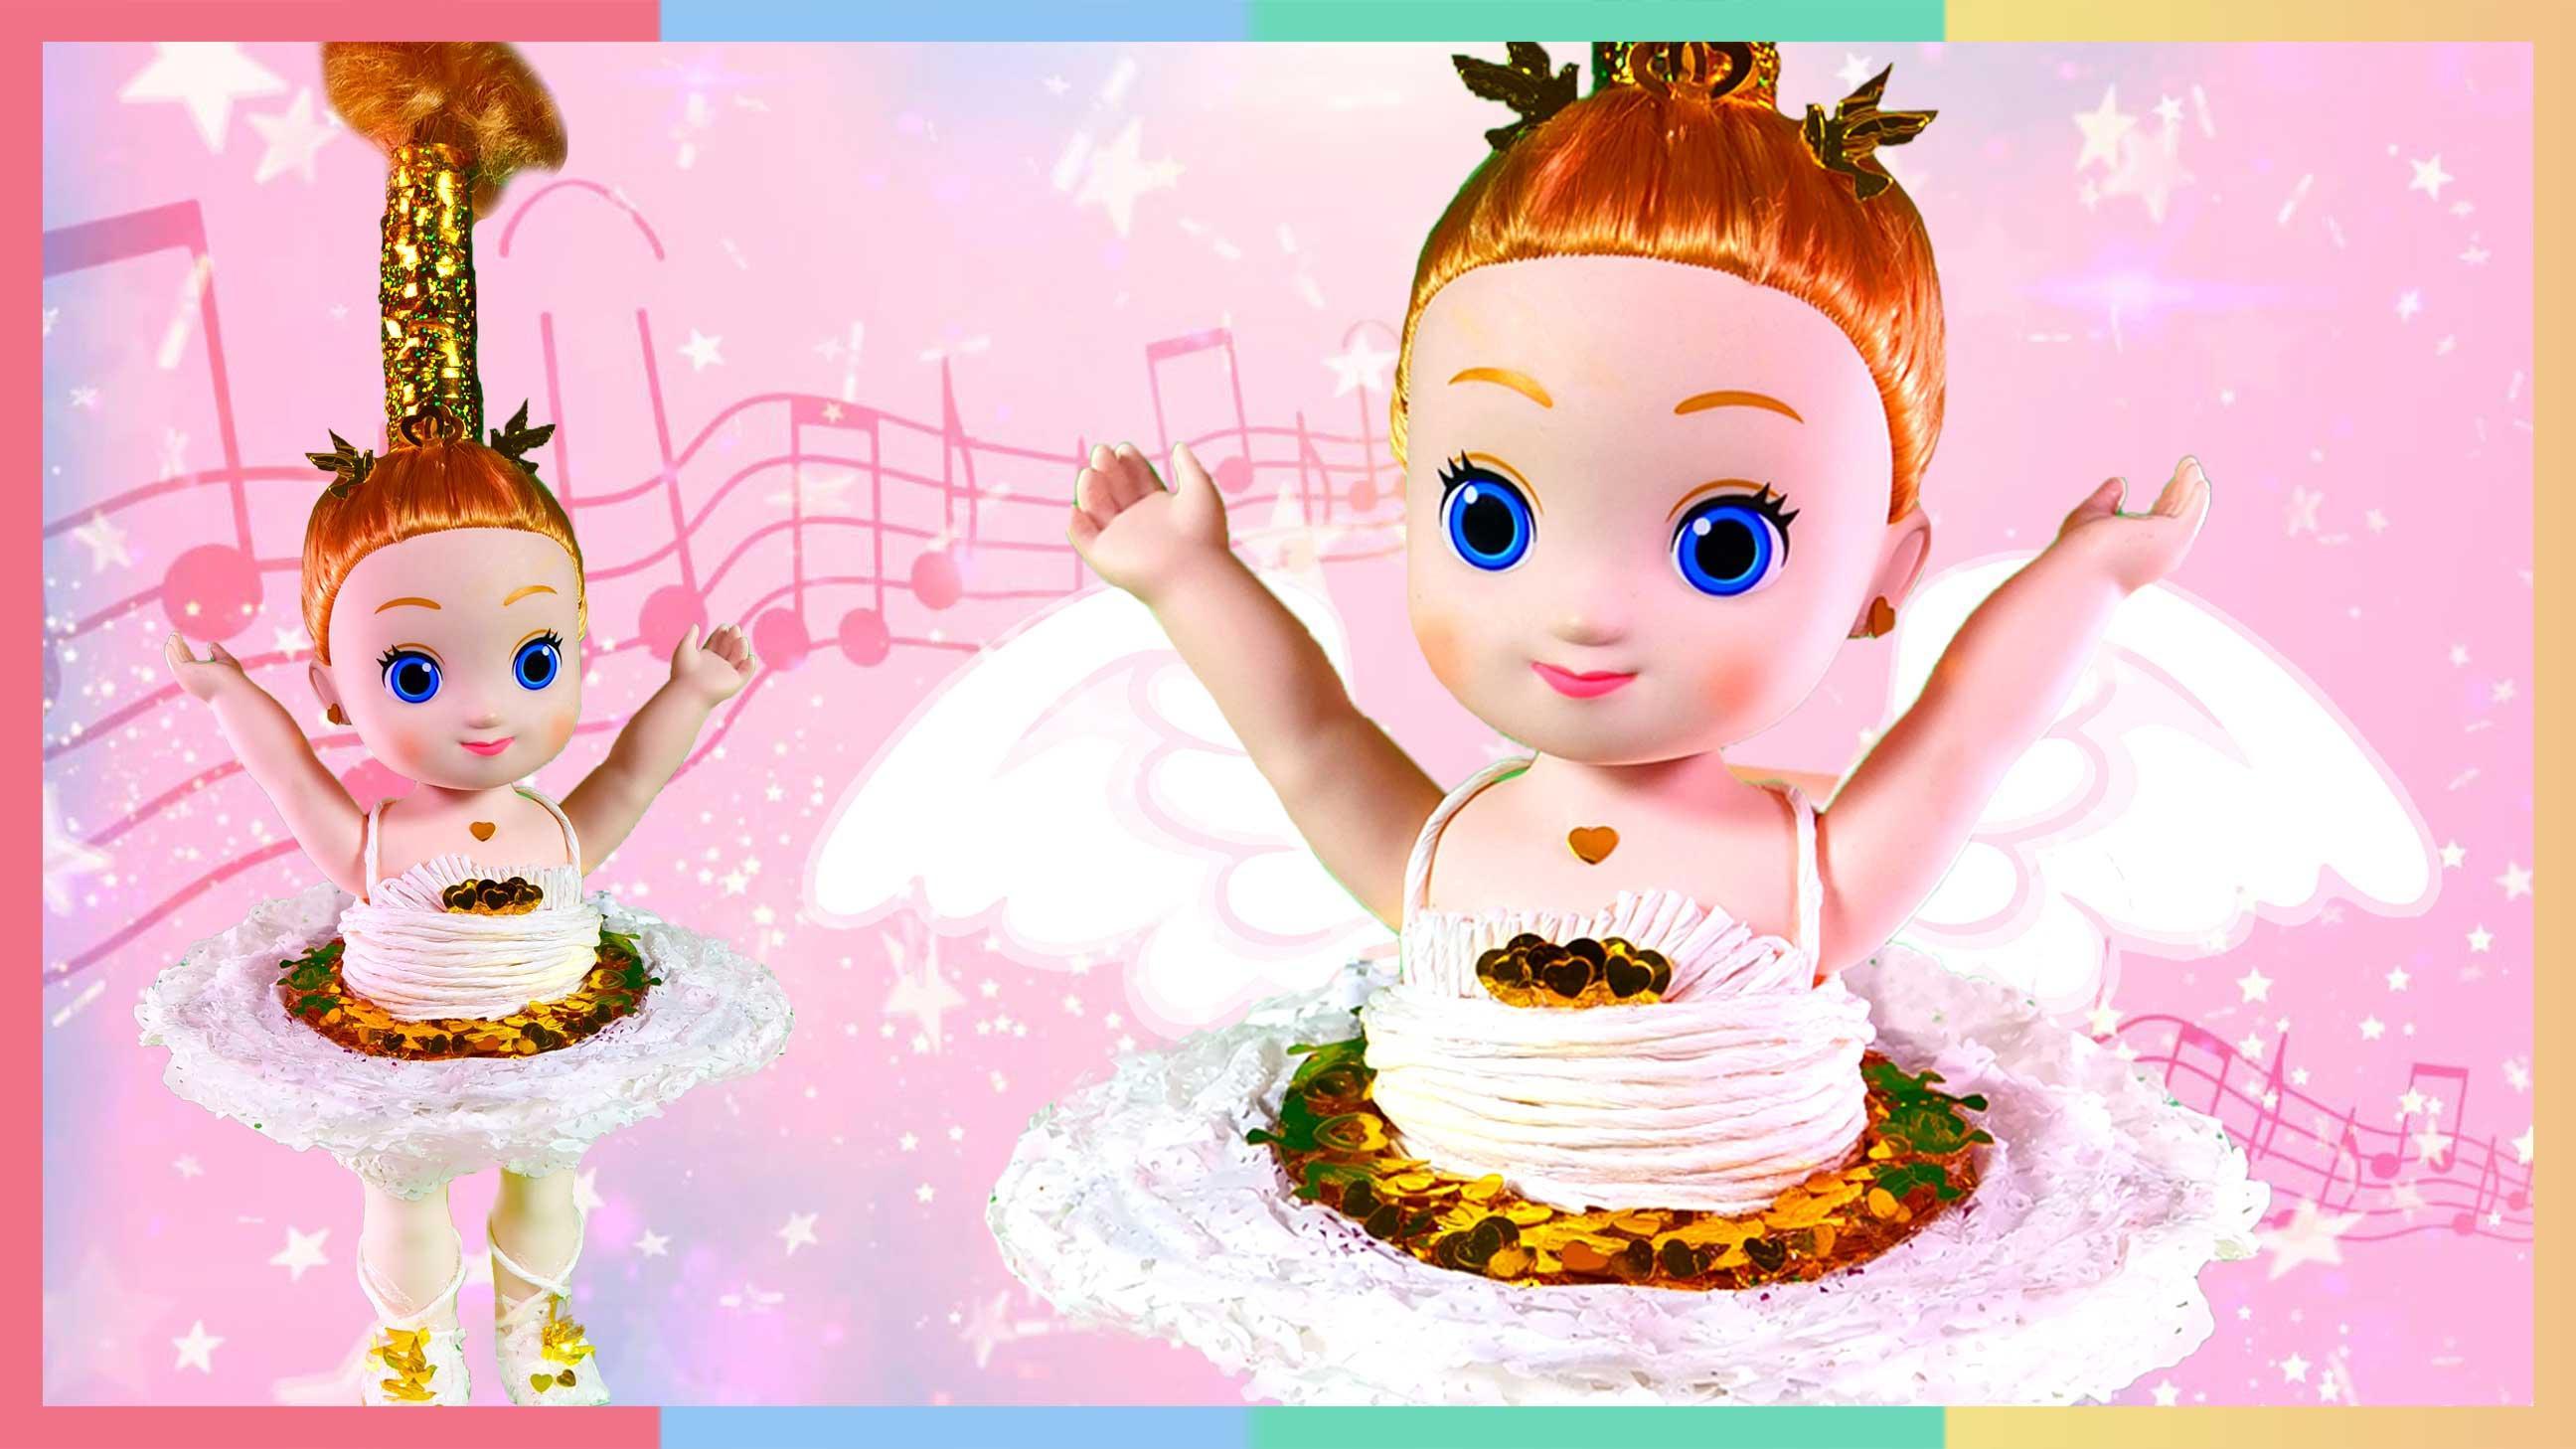 DIY天鹅公主小爱丽~去参加芭蕾舞会吧   凯利和玩具朋友们 CarrieAndToys